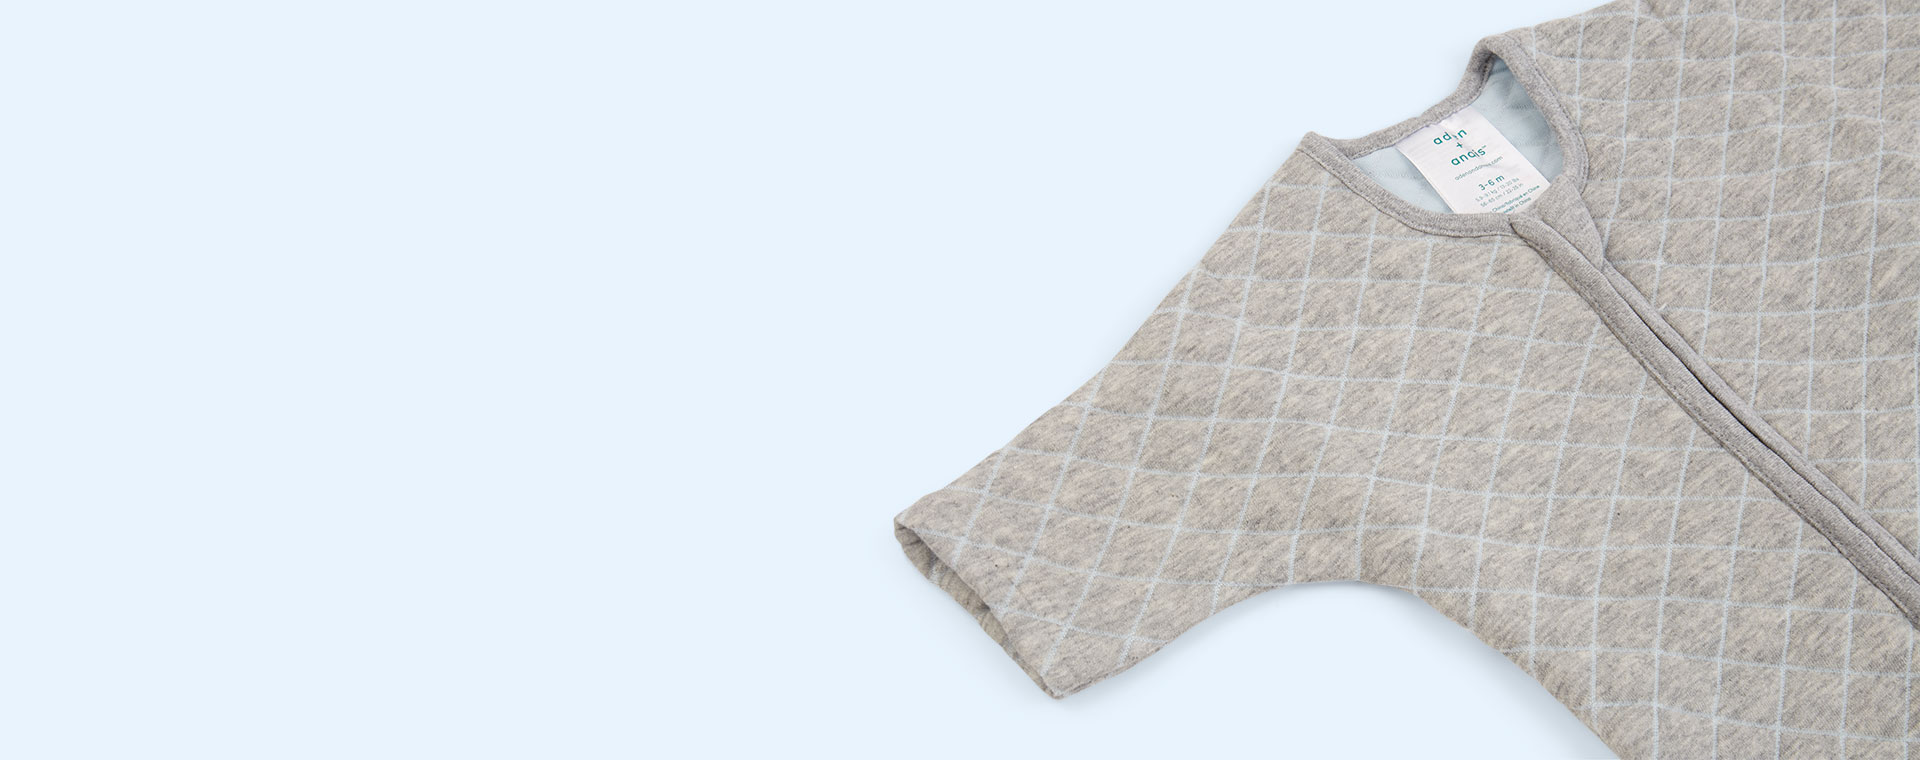 Heather Grey/Blue Stitch aden + anais Snug Fit Sleeved Sleeping Bag